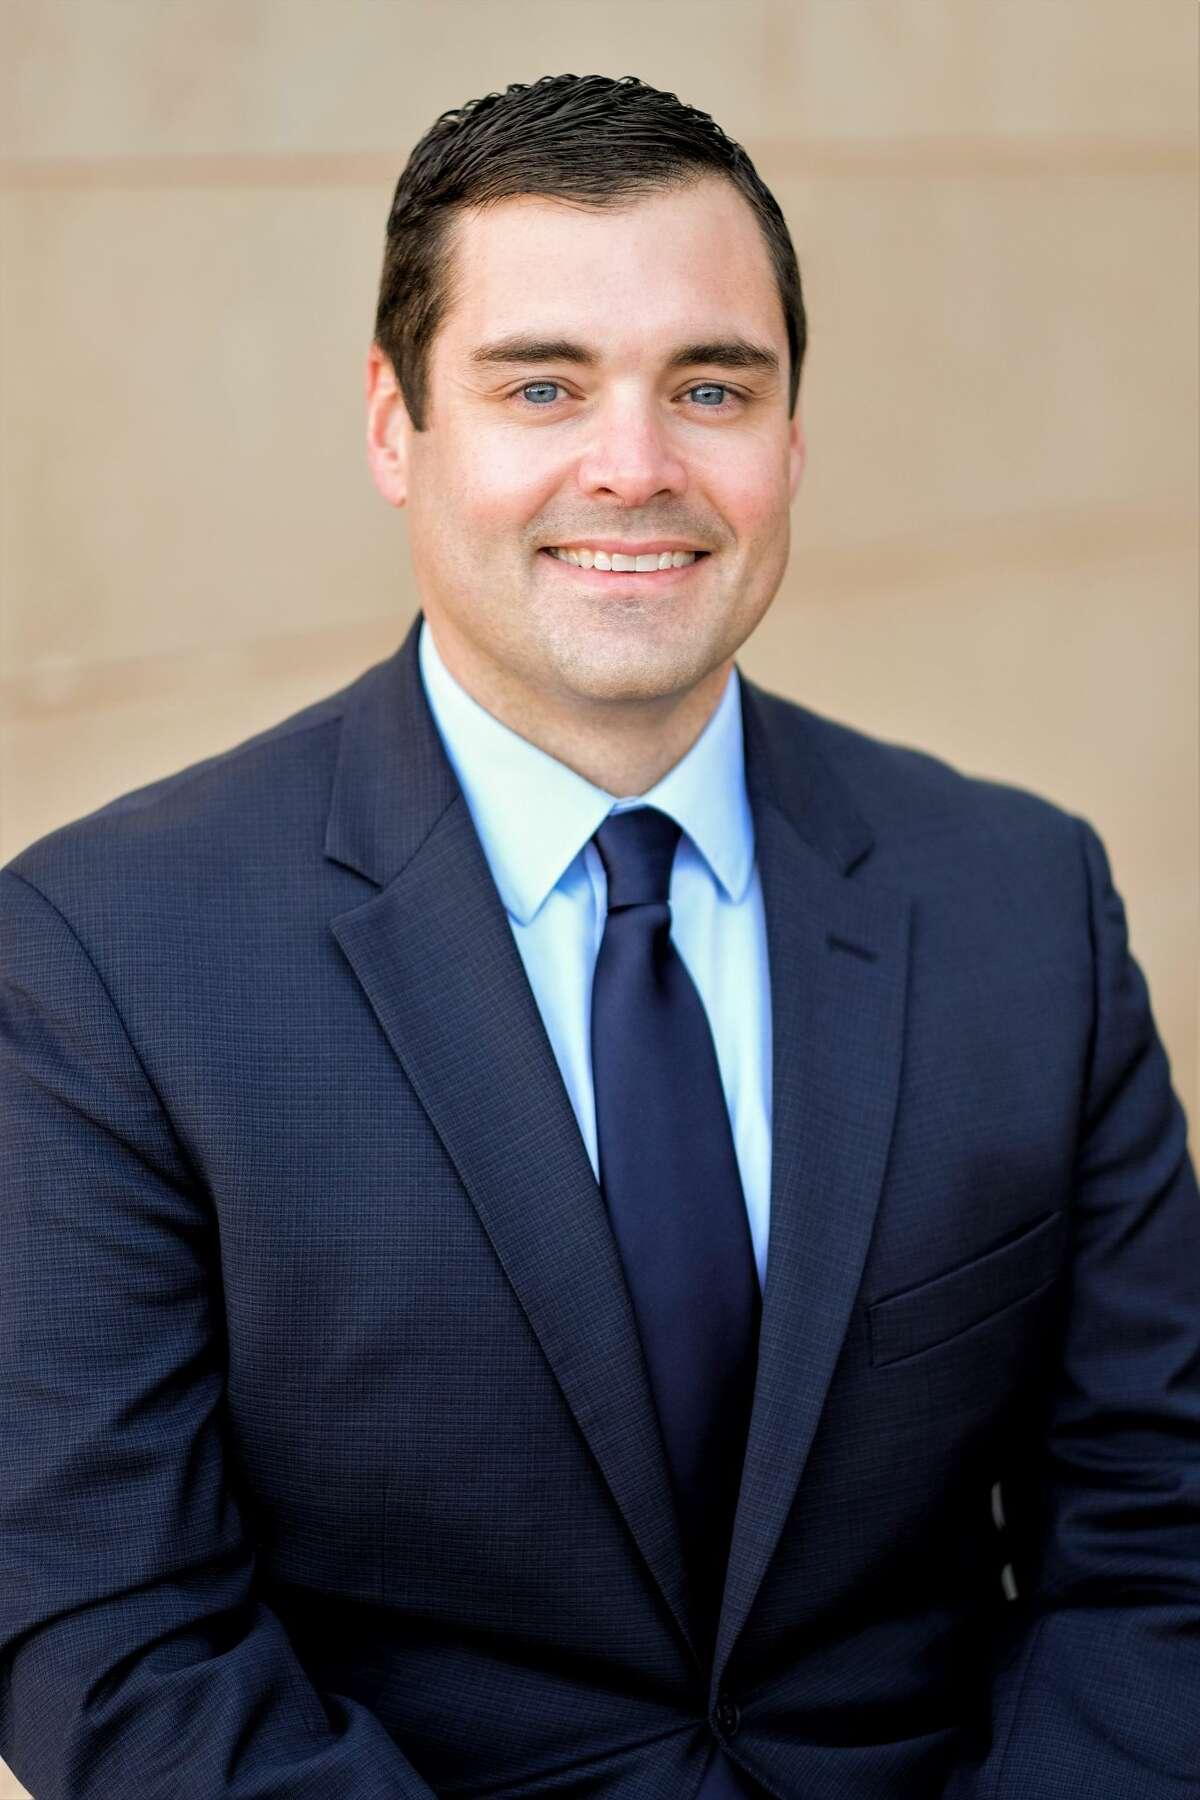 Kit Bredimus is chief nursing officer/vice president of Nursing for Midland Health.